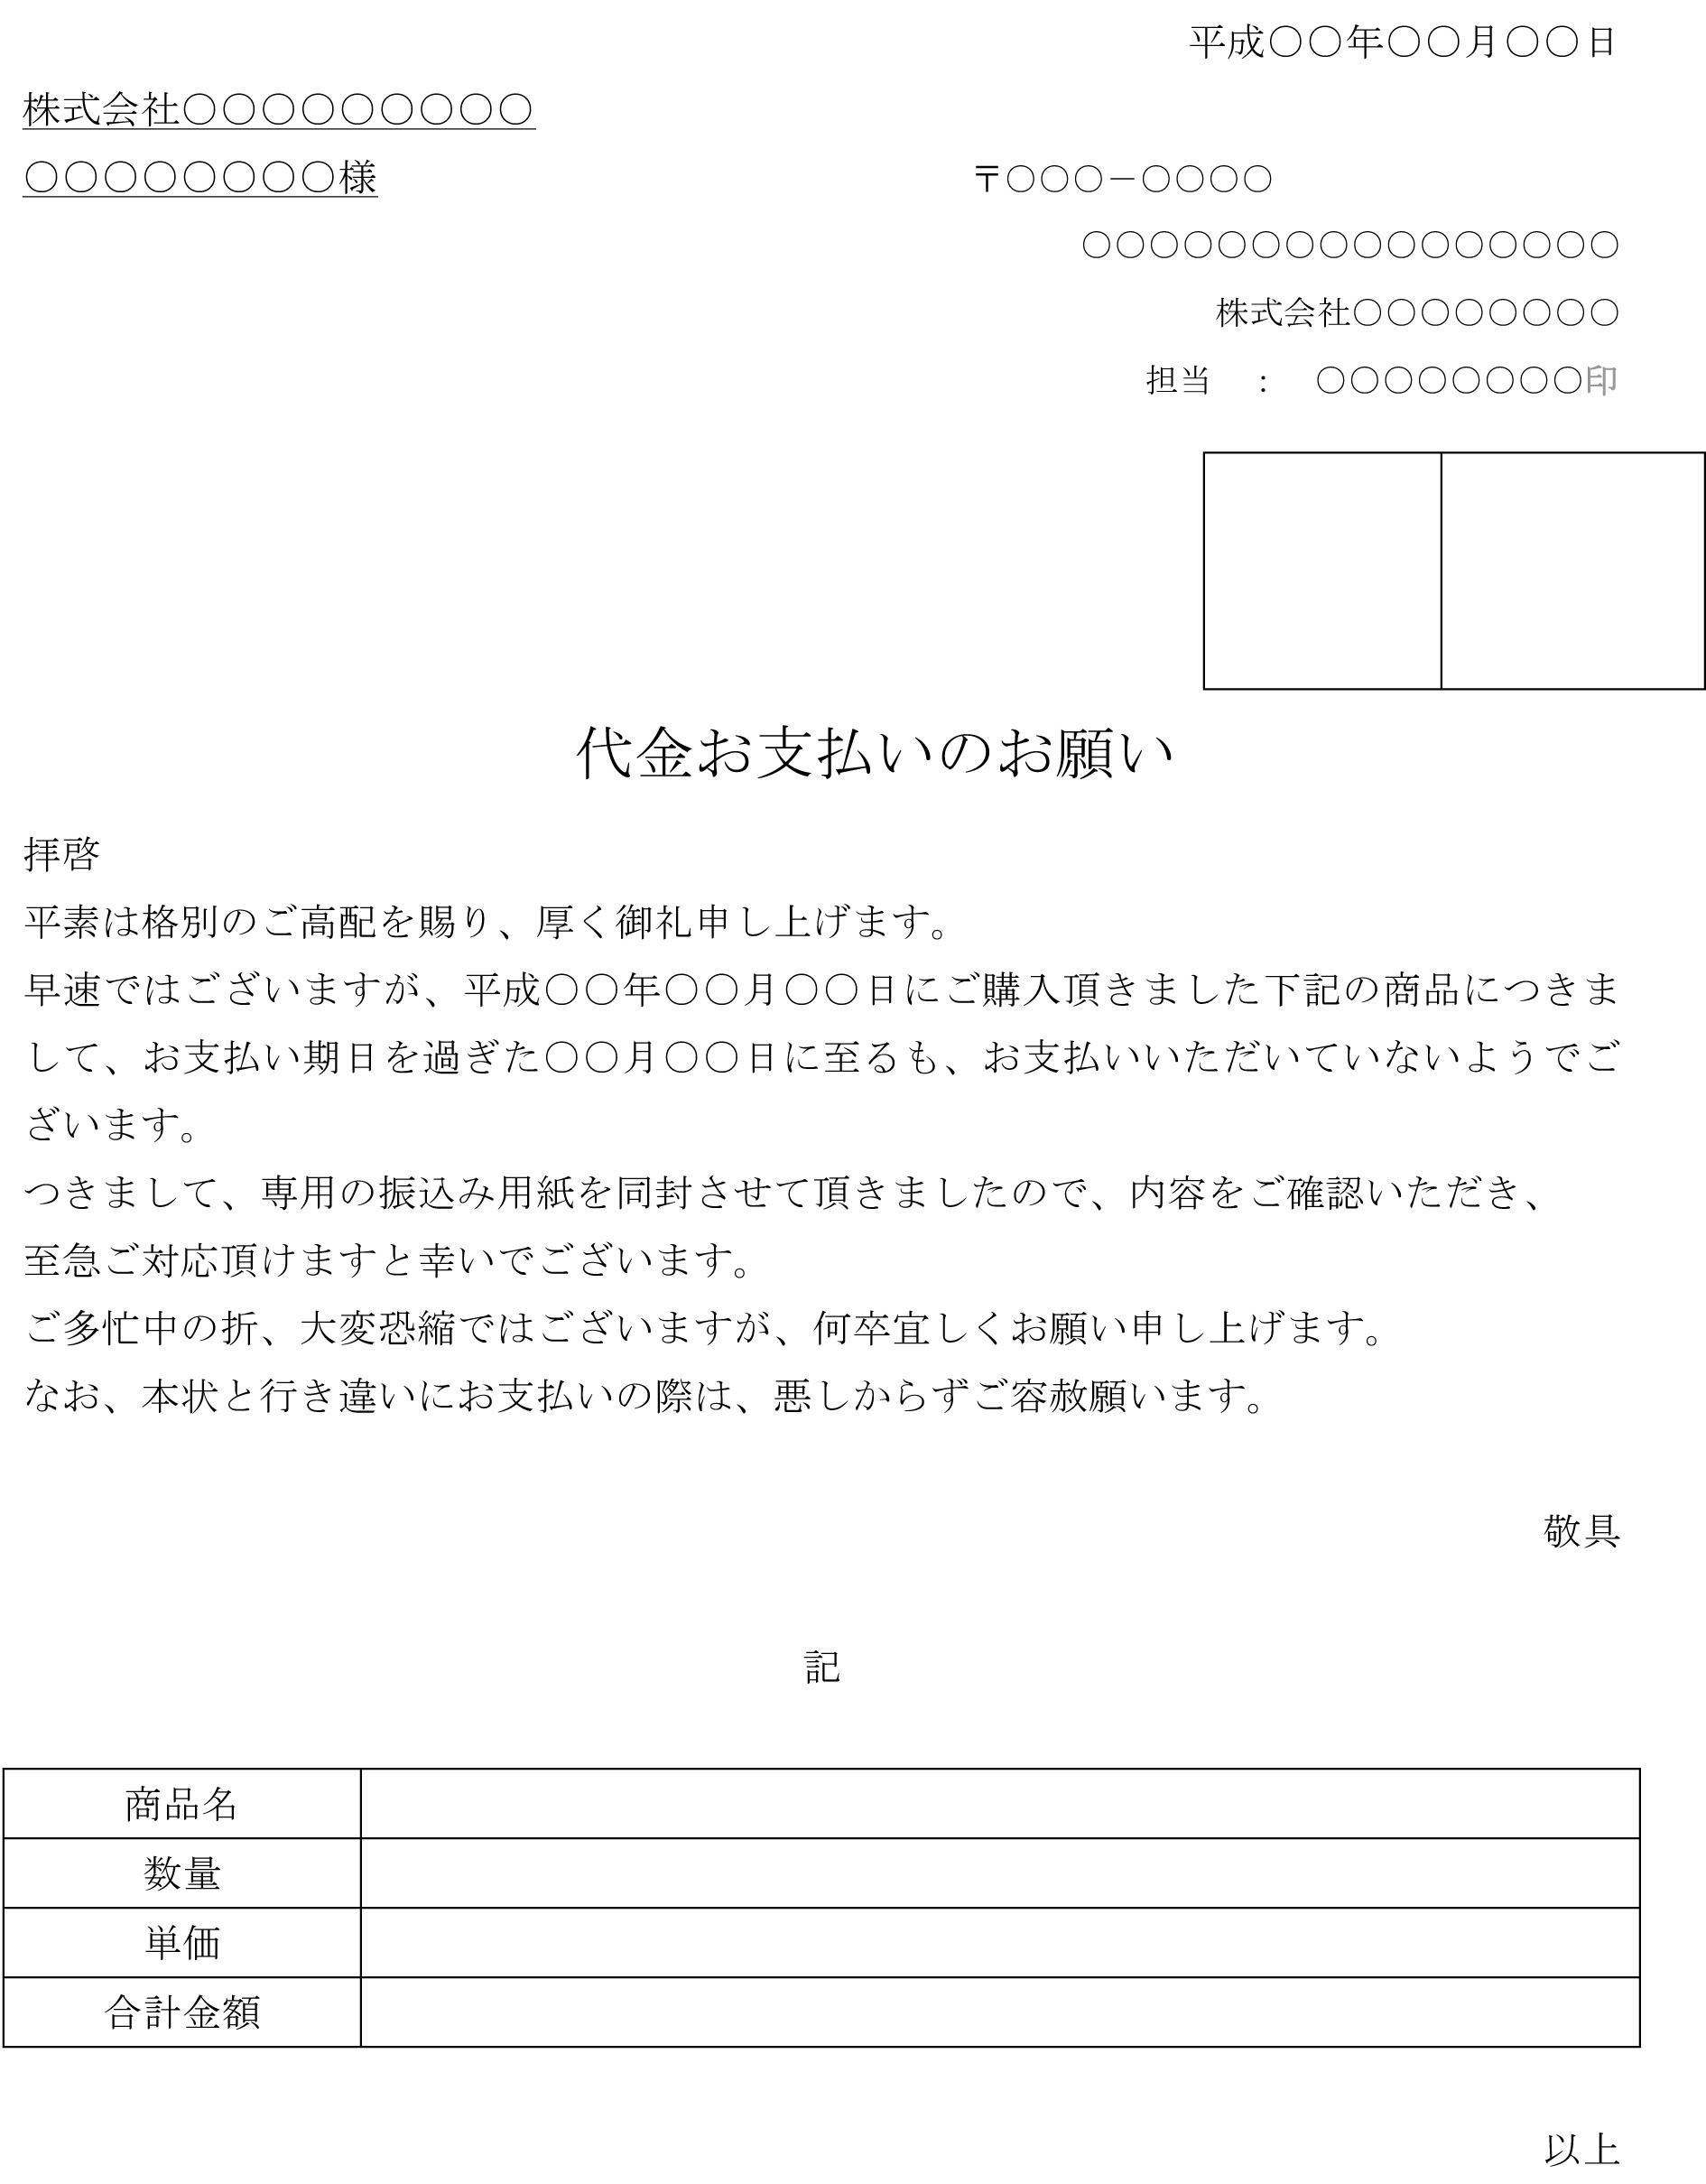 督促状(代金支払い)01